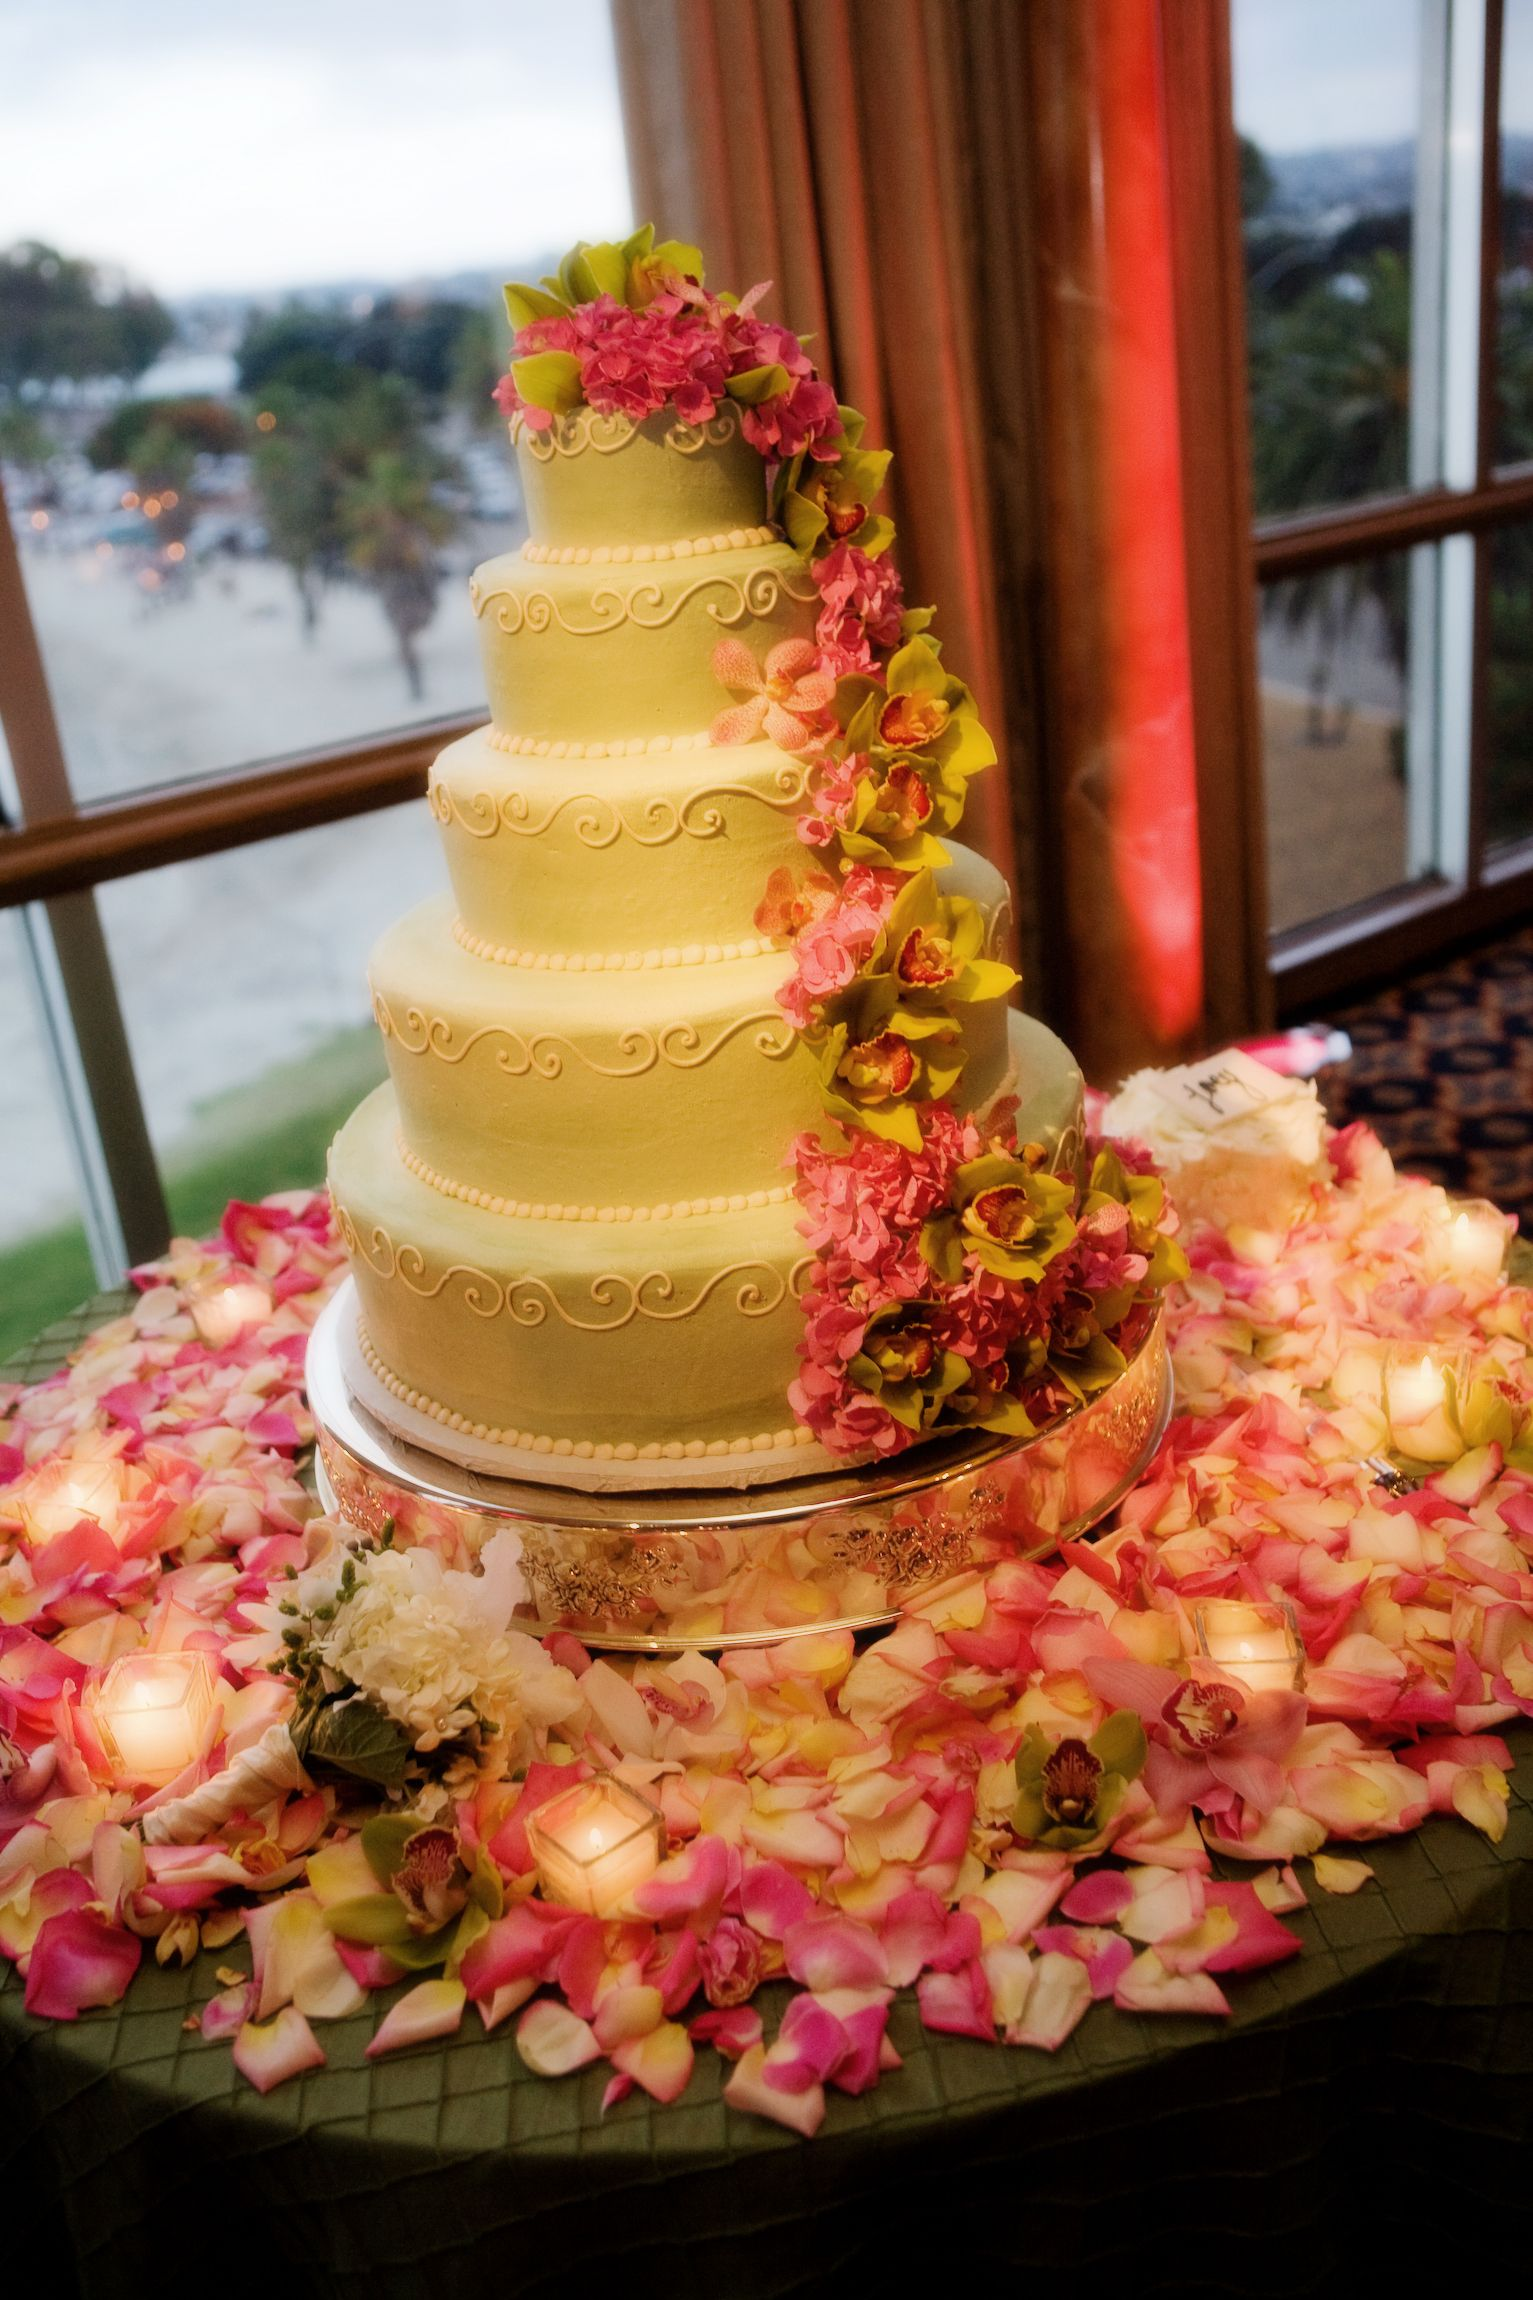 The Wedding Cake! #hintofpink